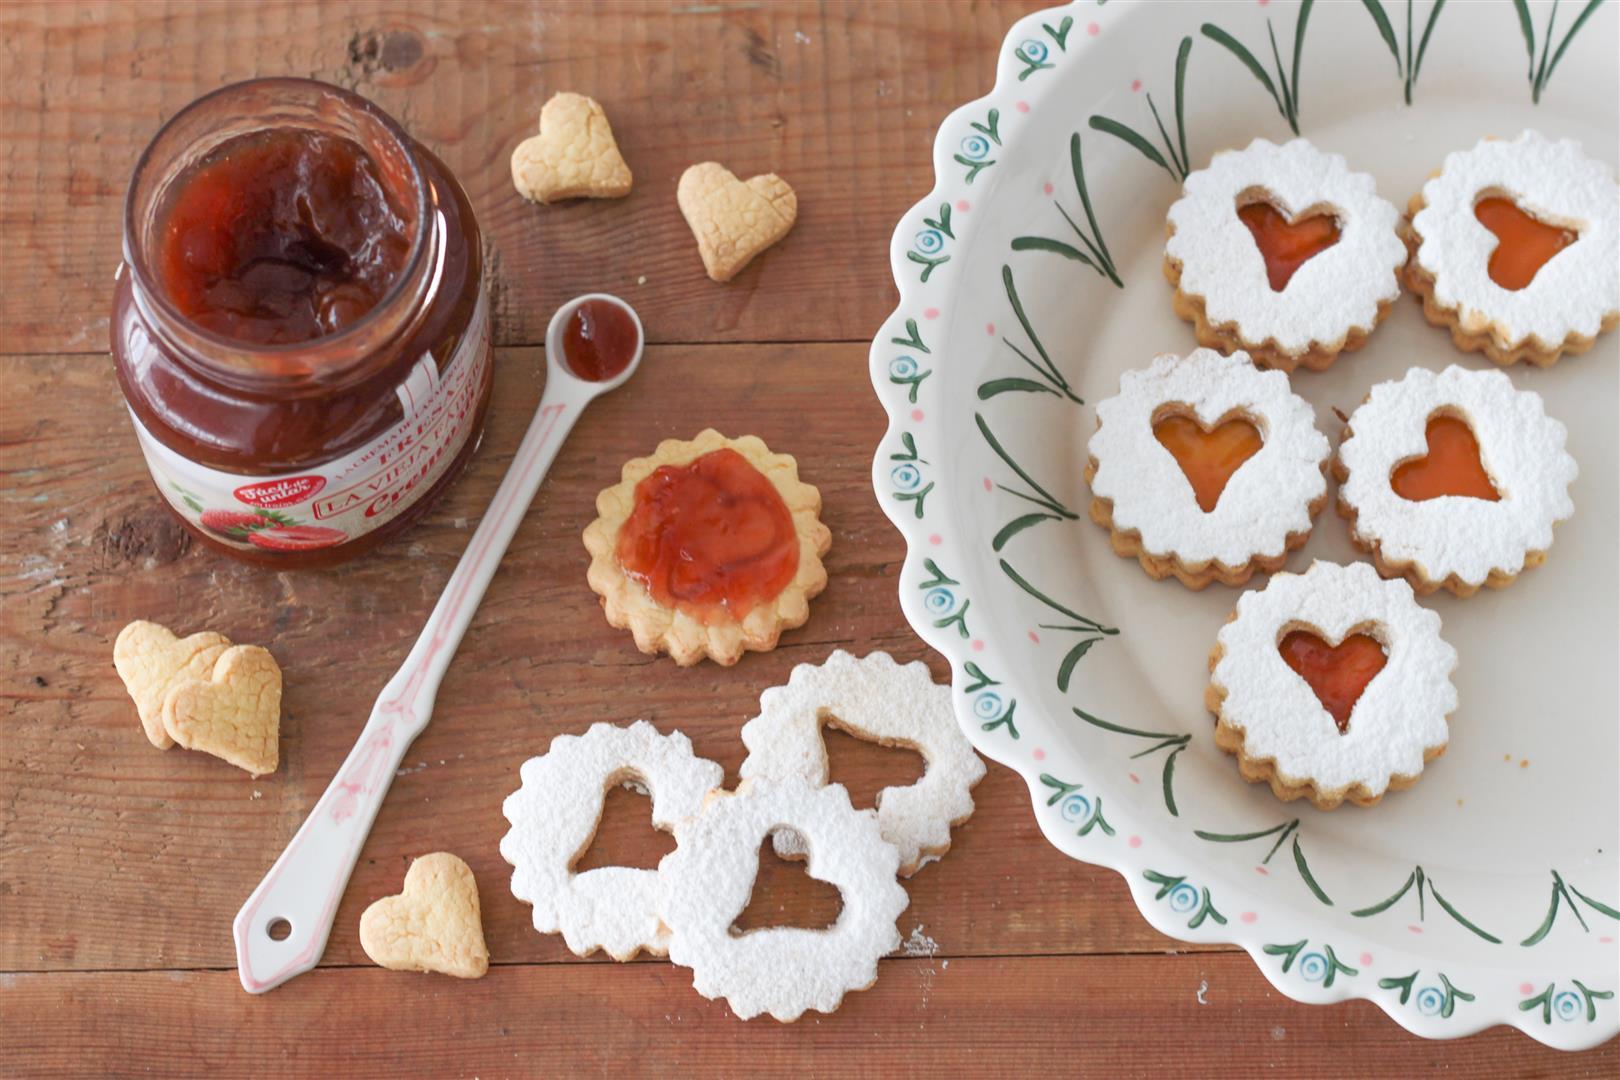 receta-galletas-mermelada-sin-gluten-celiacos-(3)